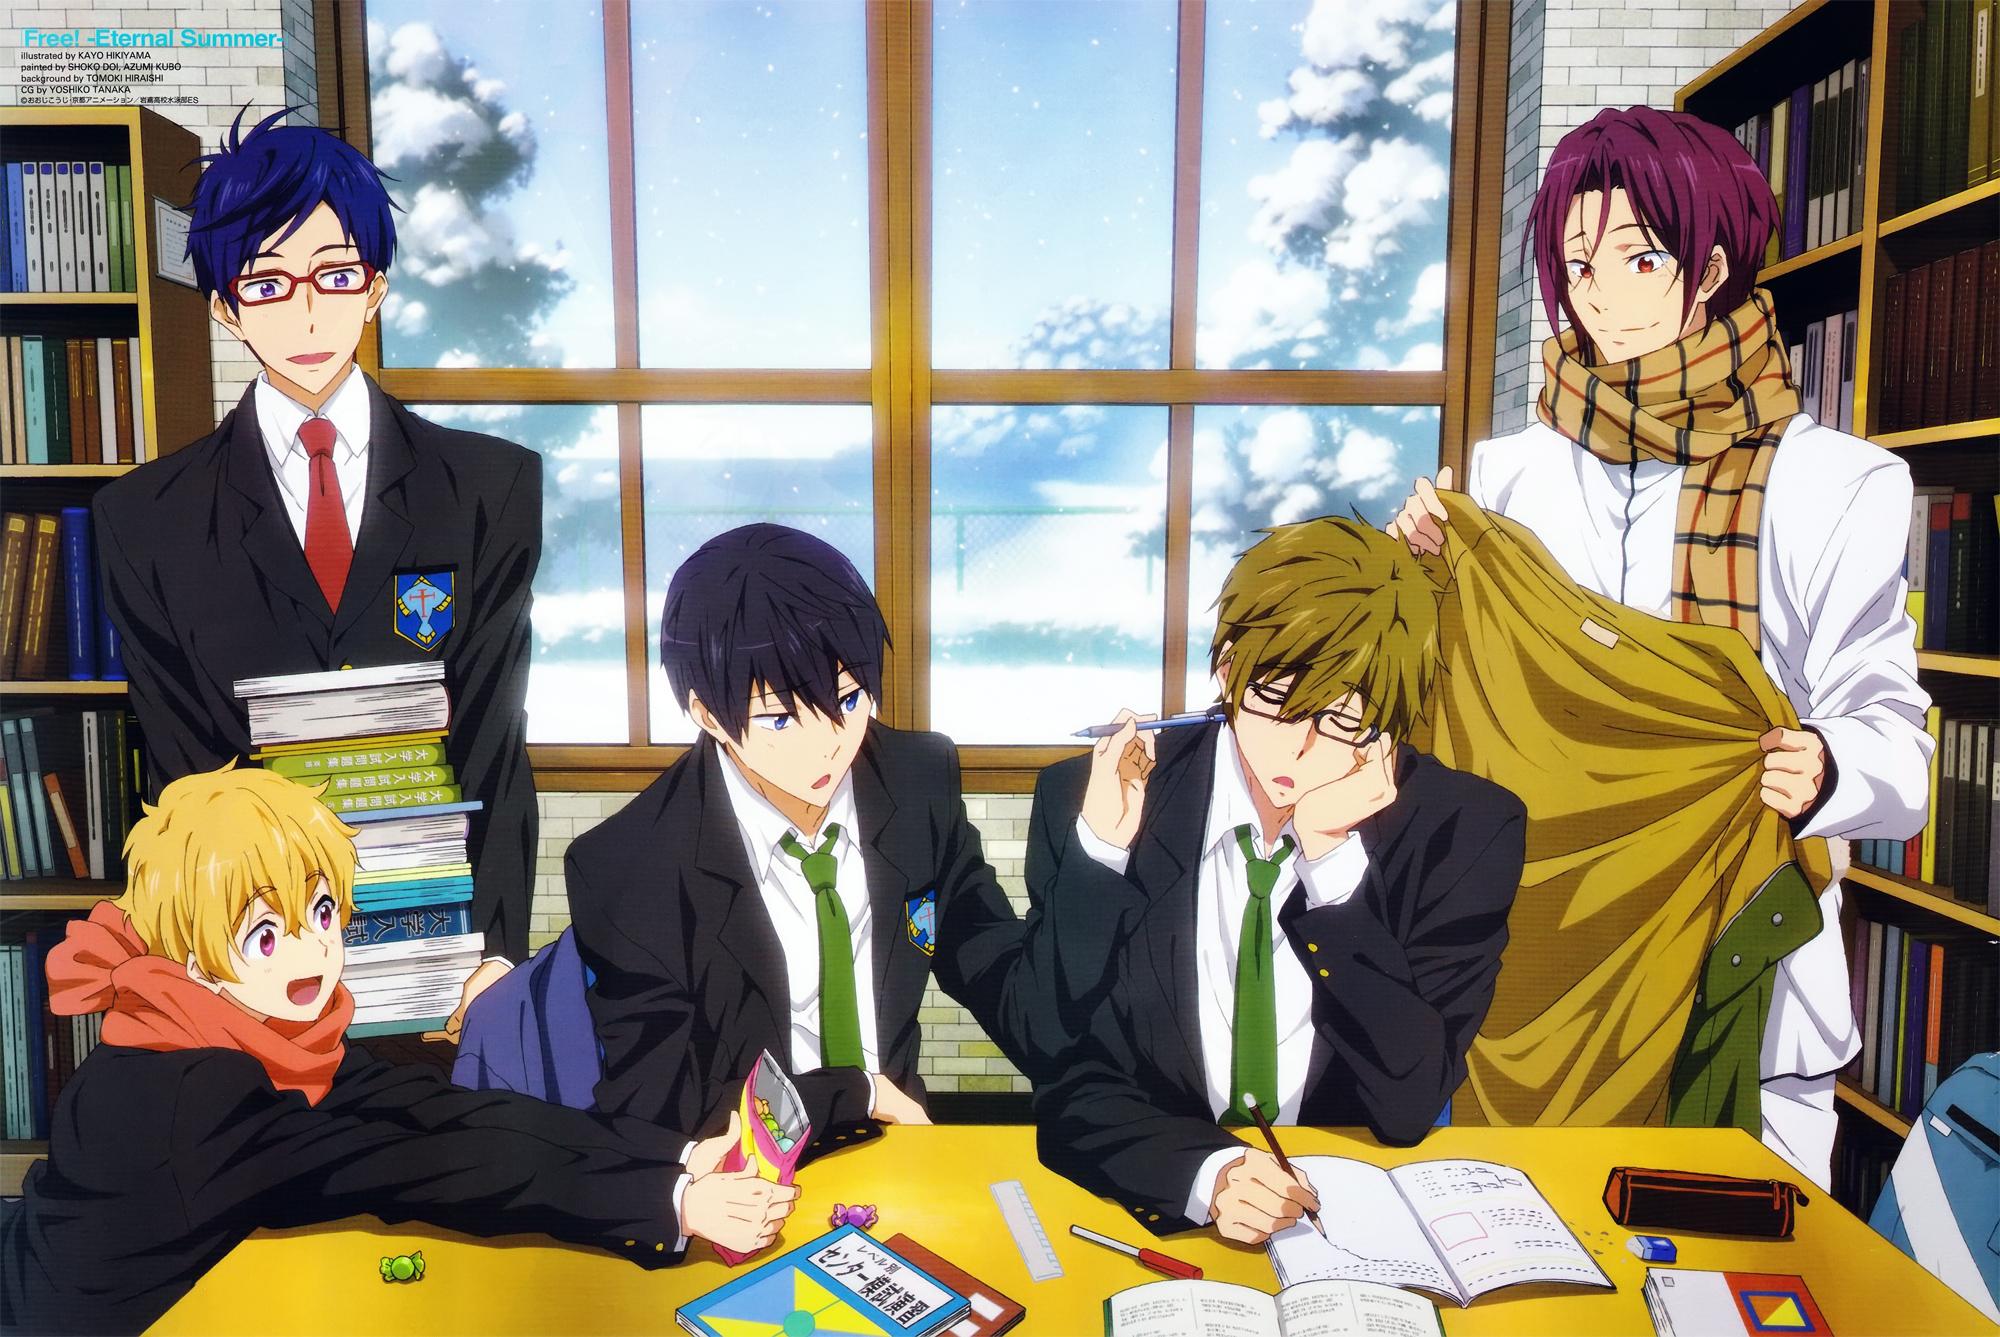 Haruhichan.com Newtype January 2015 posters free eternal summer